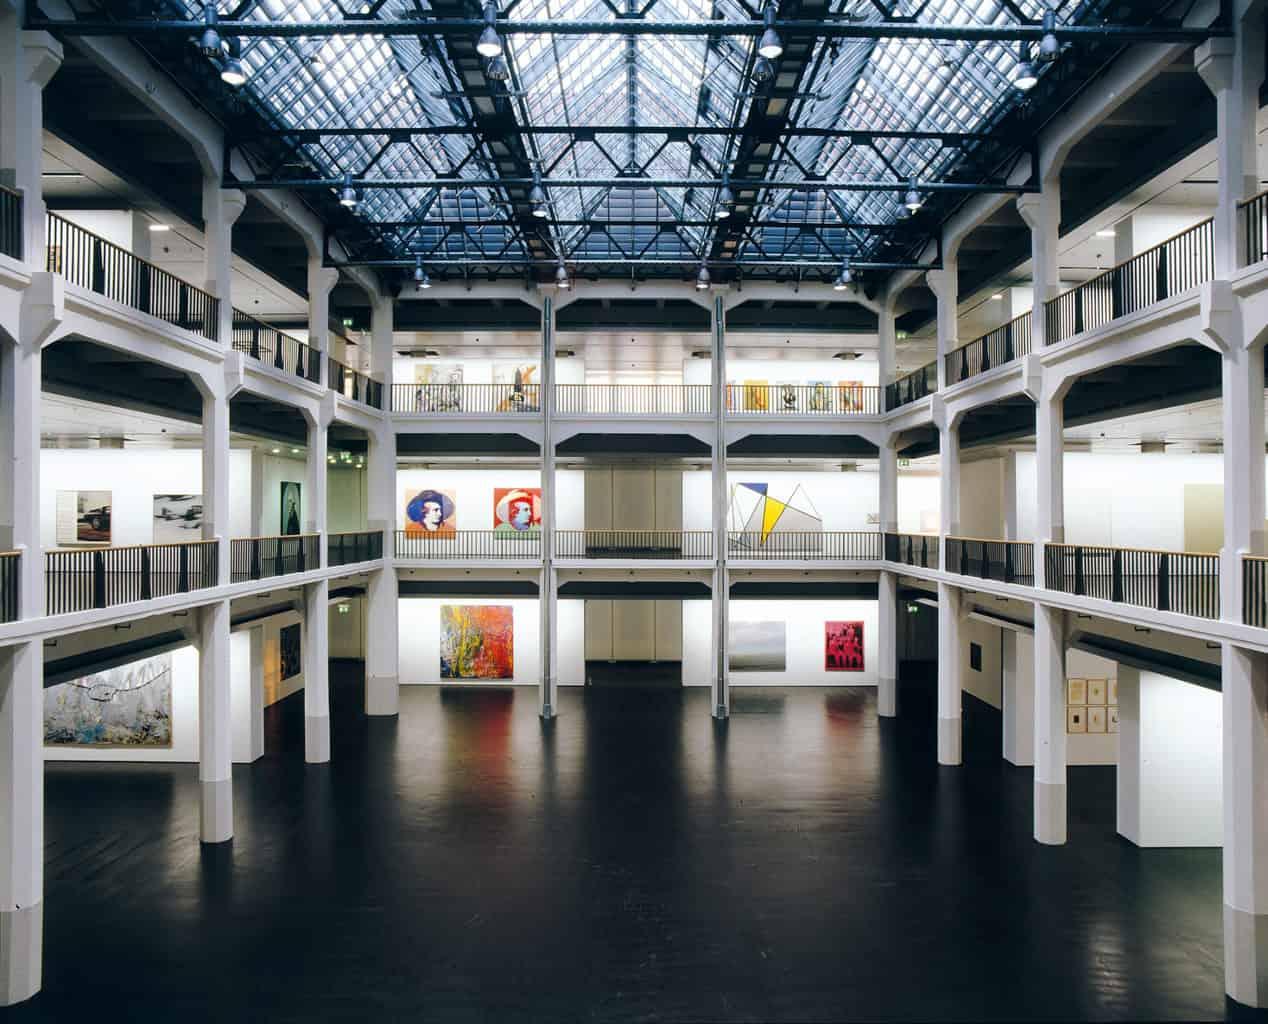 Het centrum voor cultuur en media in Karlsruhe